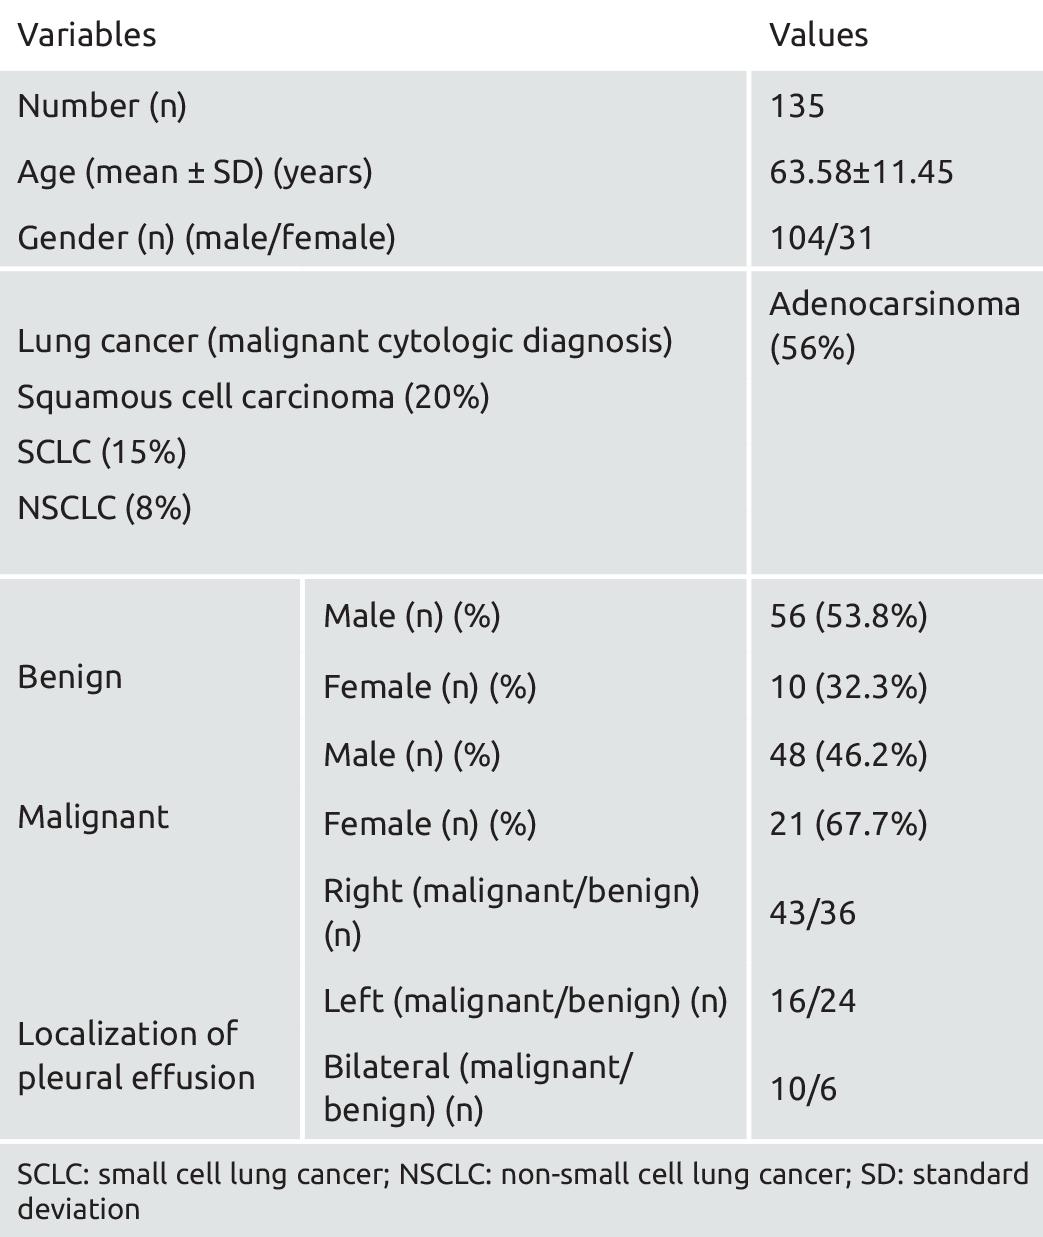 lung cancer benign pleural effusion